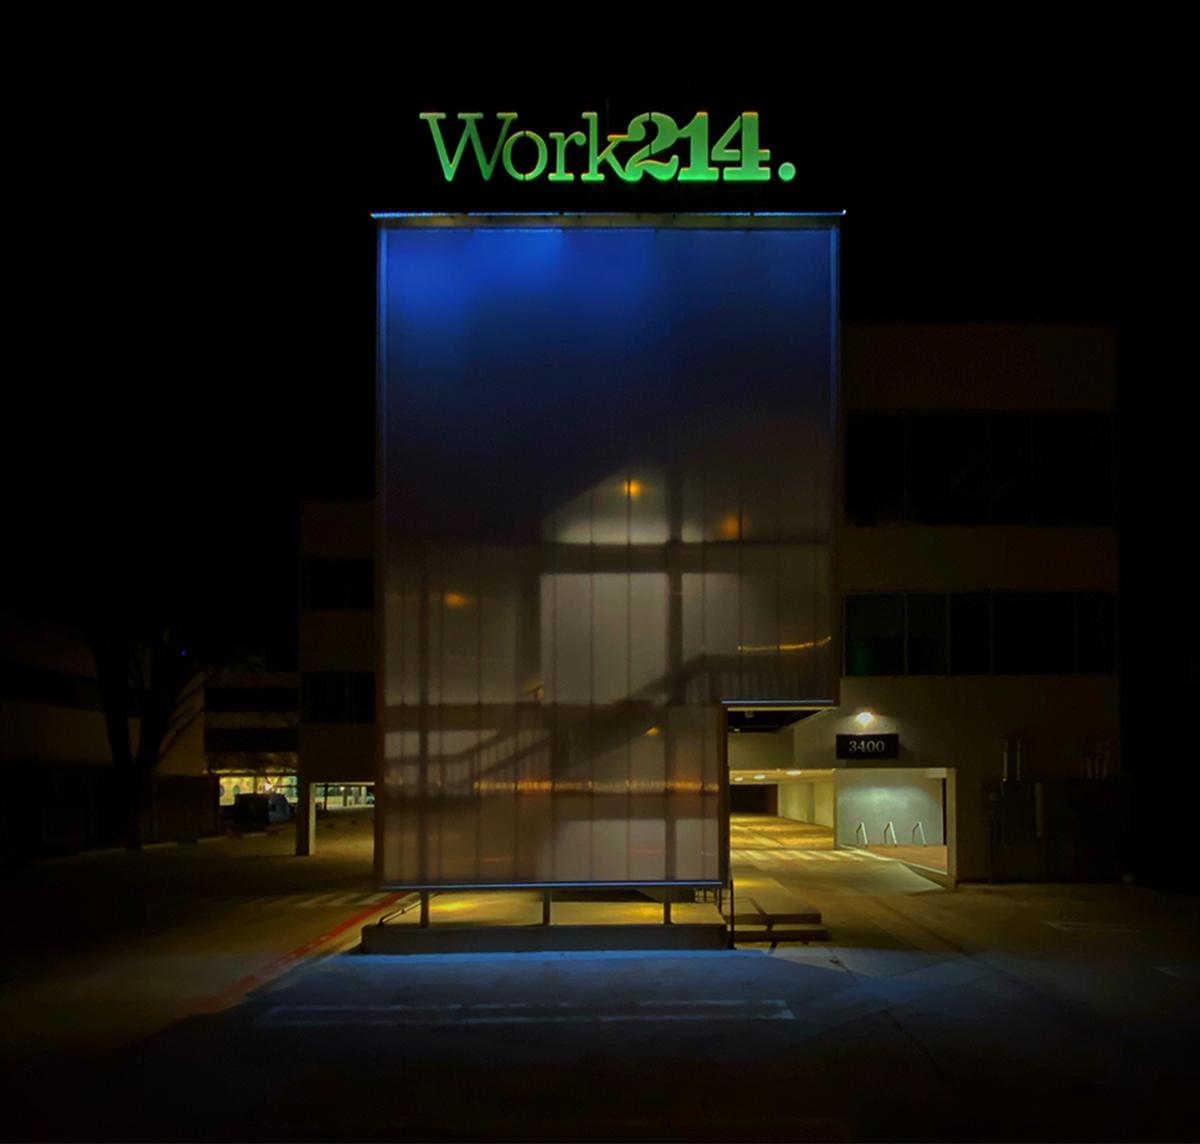 Work214 at Night